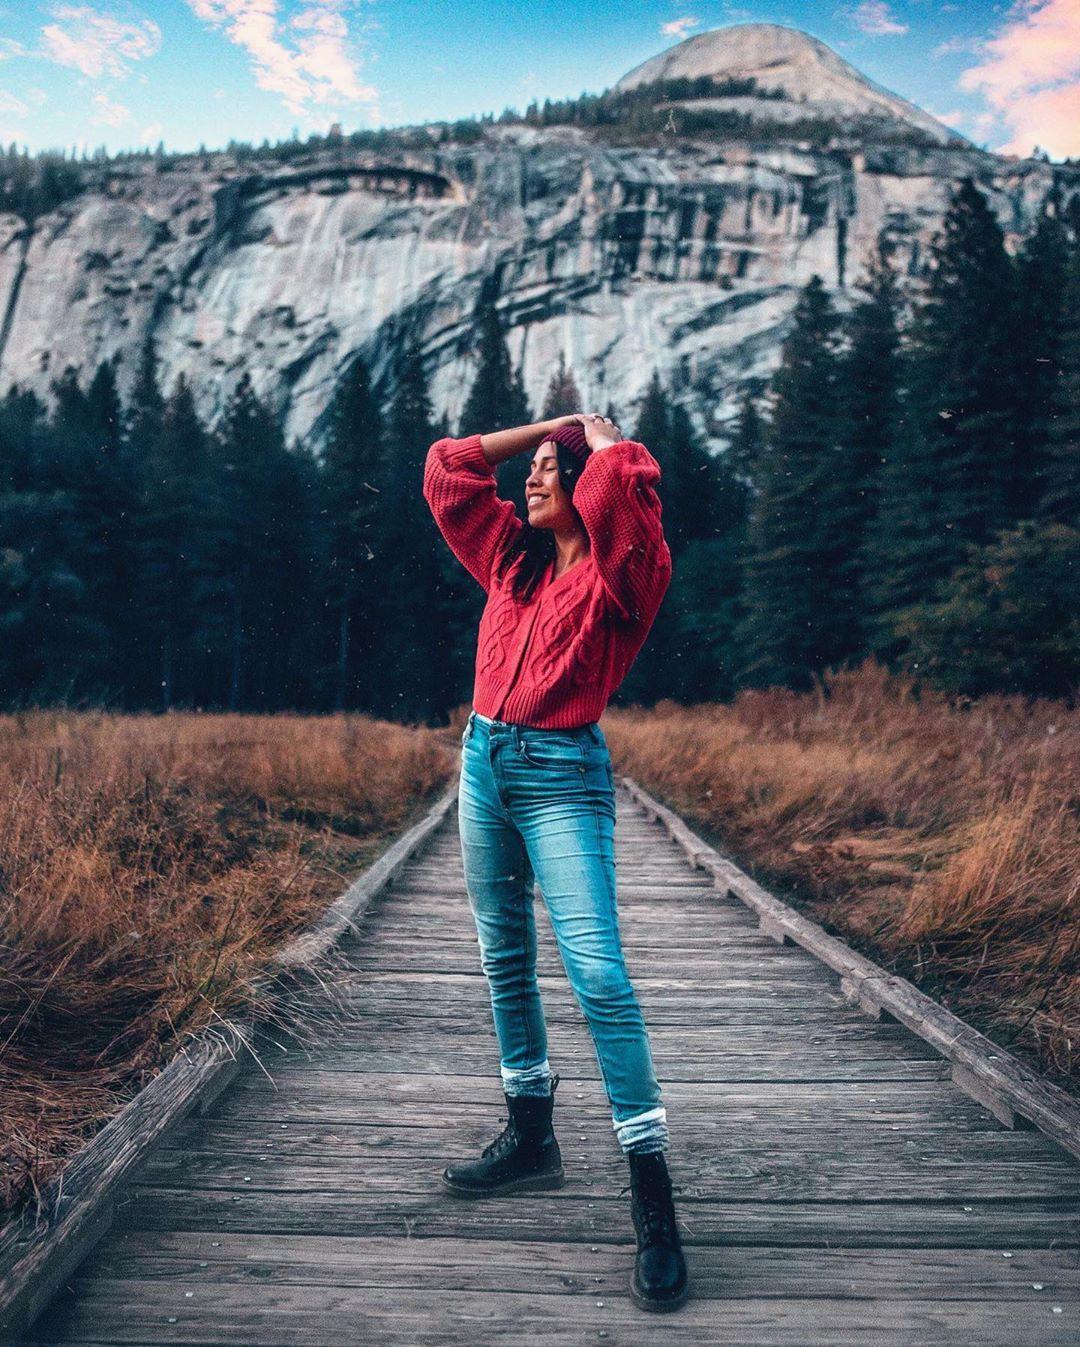 Trendy clothing ideas yosemite national park yosemite national park, mountainous landforms